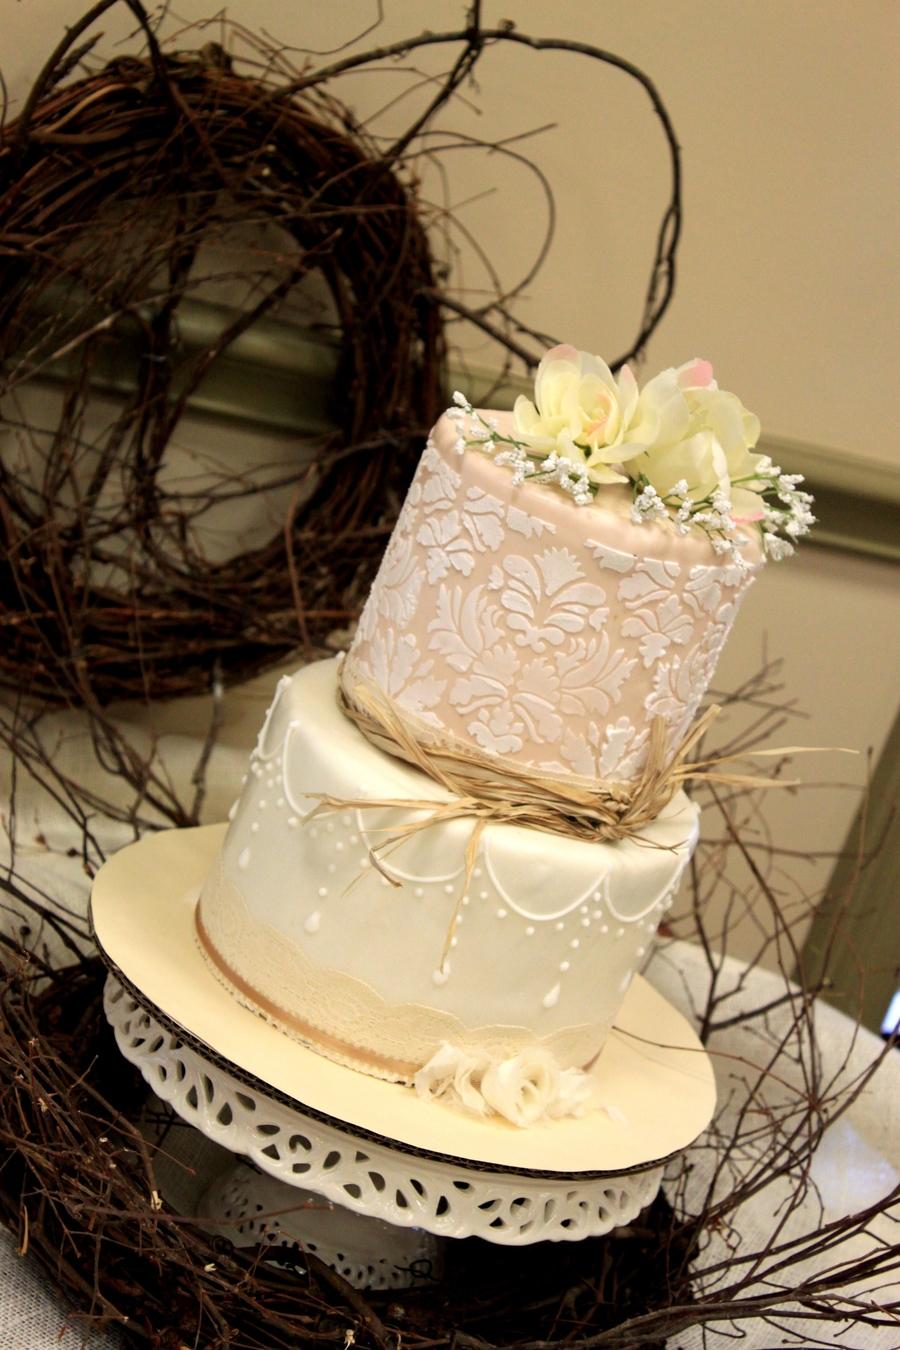 Pleasing Vintage Bridal Shower Cake On Cake Central Vintage Bridal Shower Cake Bridal Shower Cakes Near Me Bridal Shower Cakes Or Cupcakes baby shower Bridal Shower Cakes